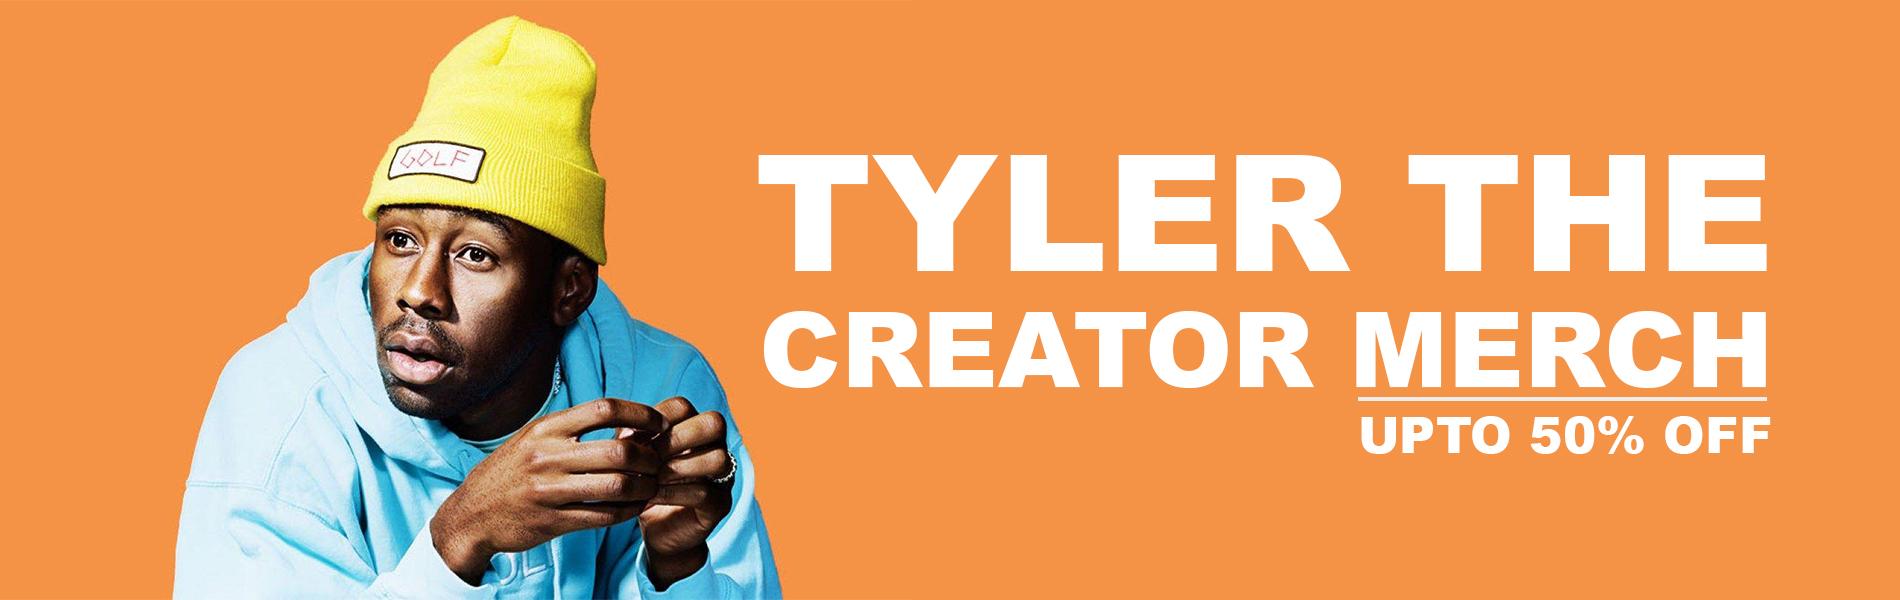 tyler the creator merch